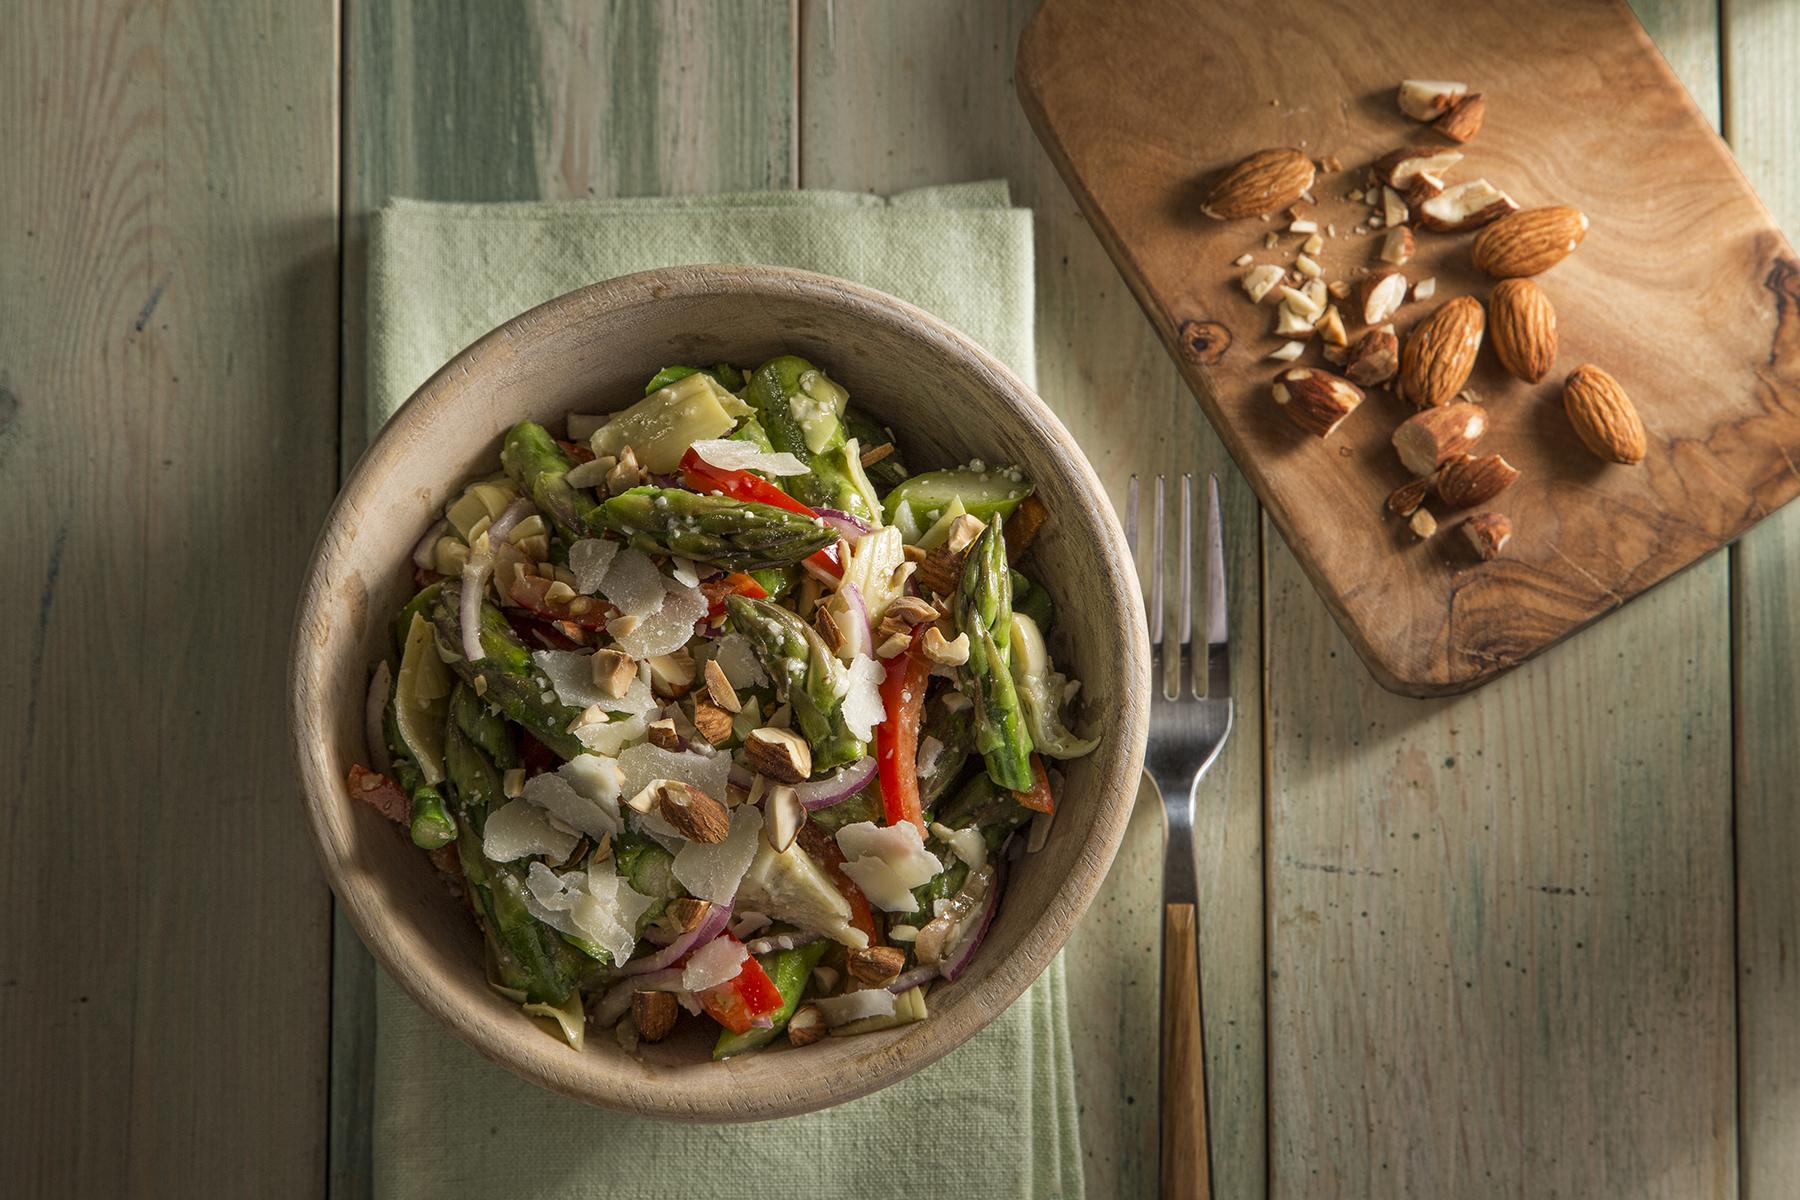 Asparagus_Artchoke_Almond Salad_small.jpg